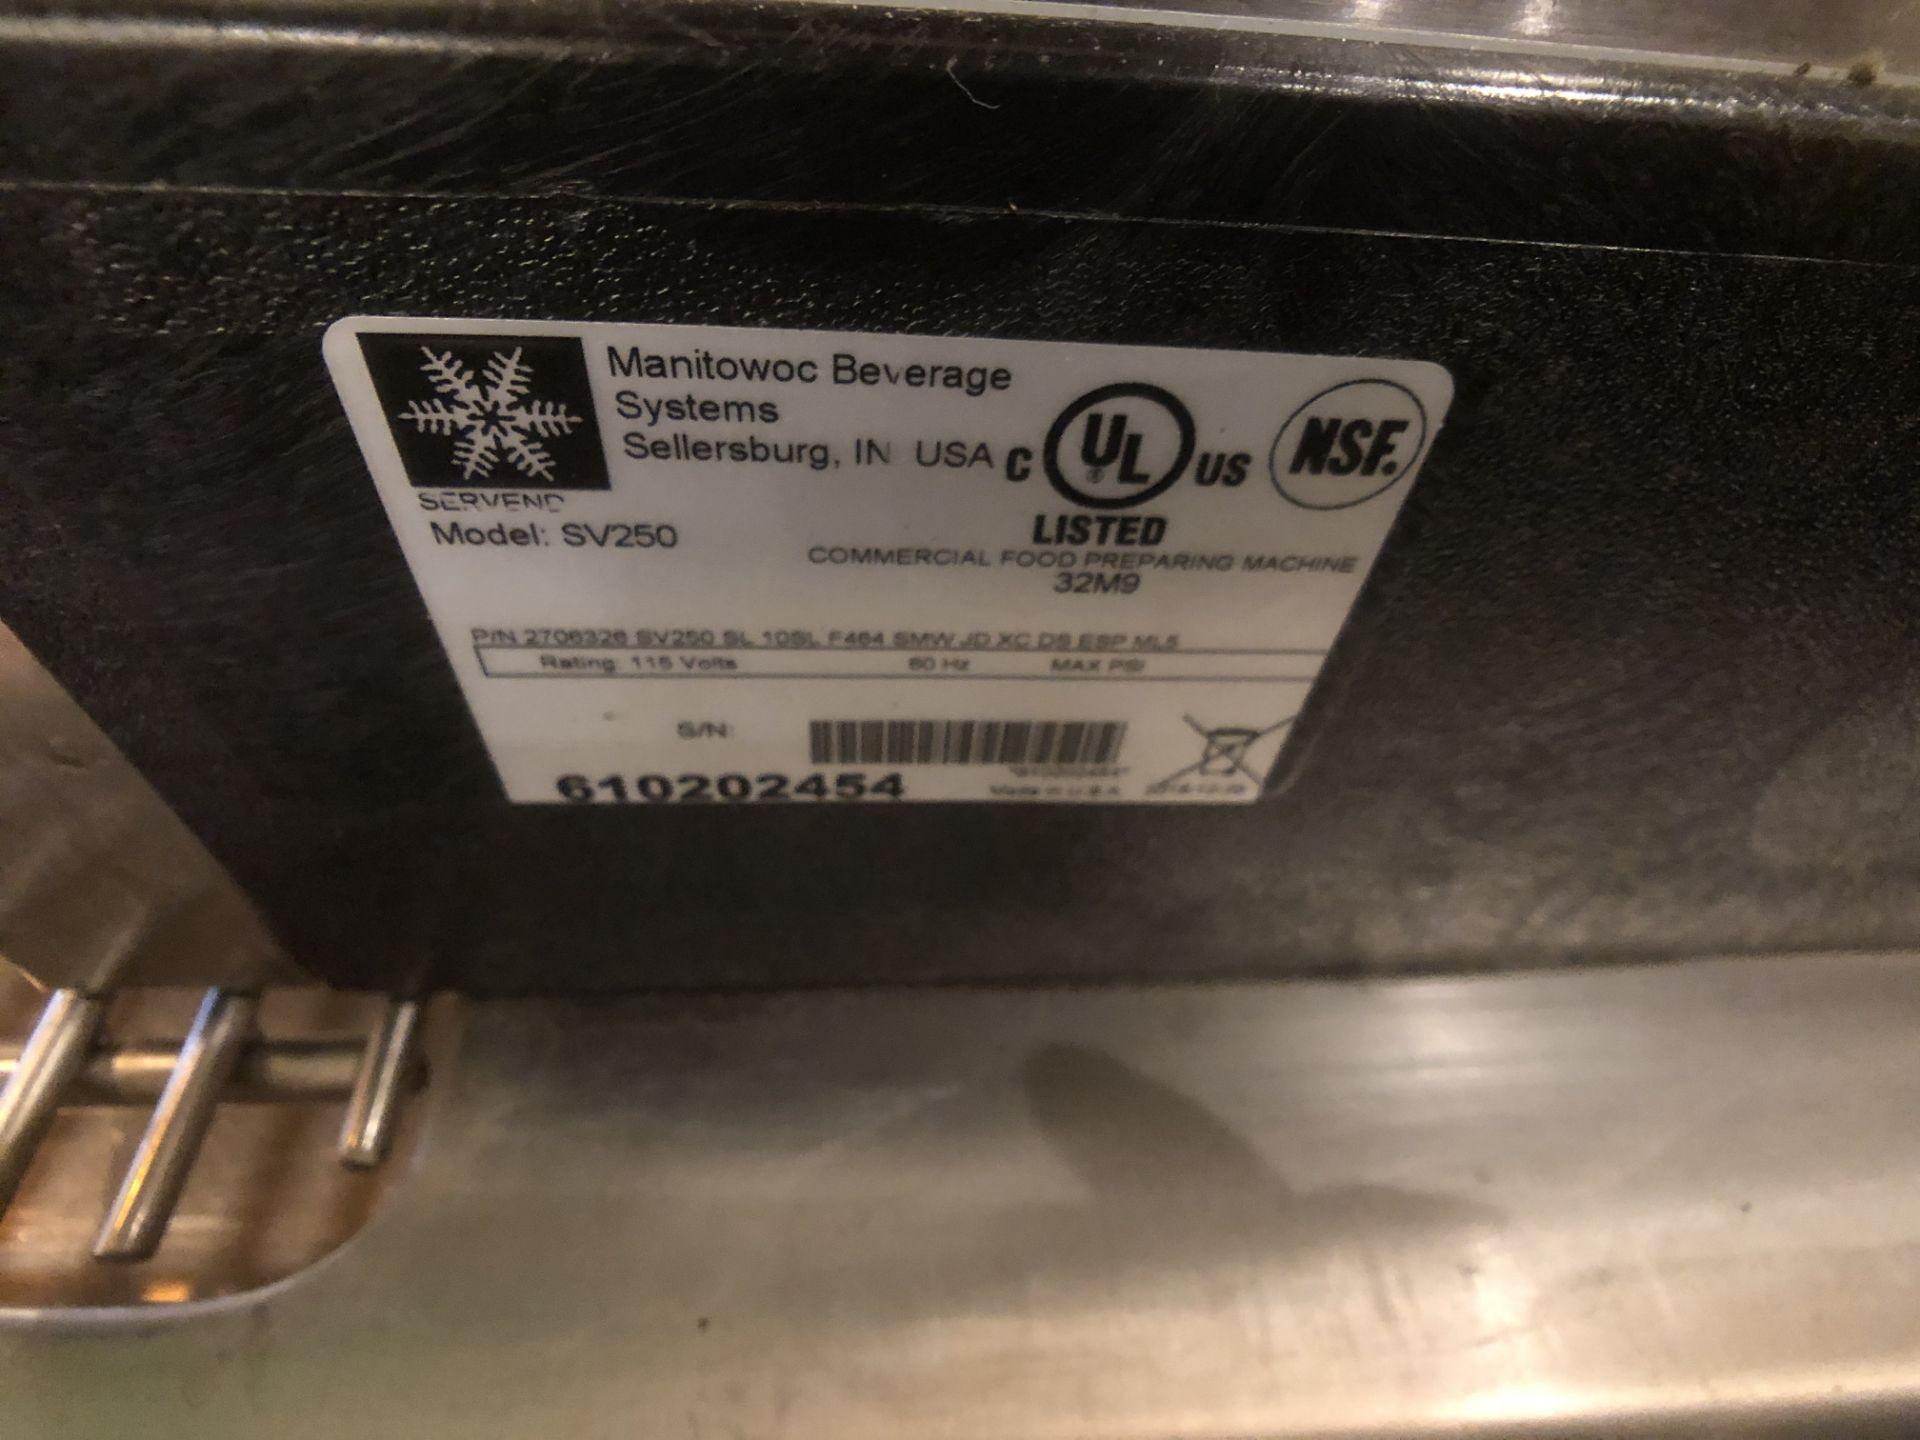 Manitowoc Beverage Systems 10-Valve Soft Drink Dispenser, Model SV250, S/N 610202454, with Hoshizaki - Image 3 of 10